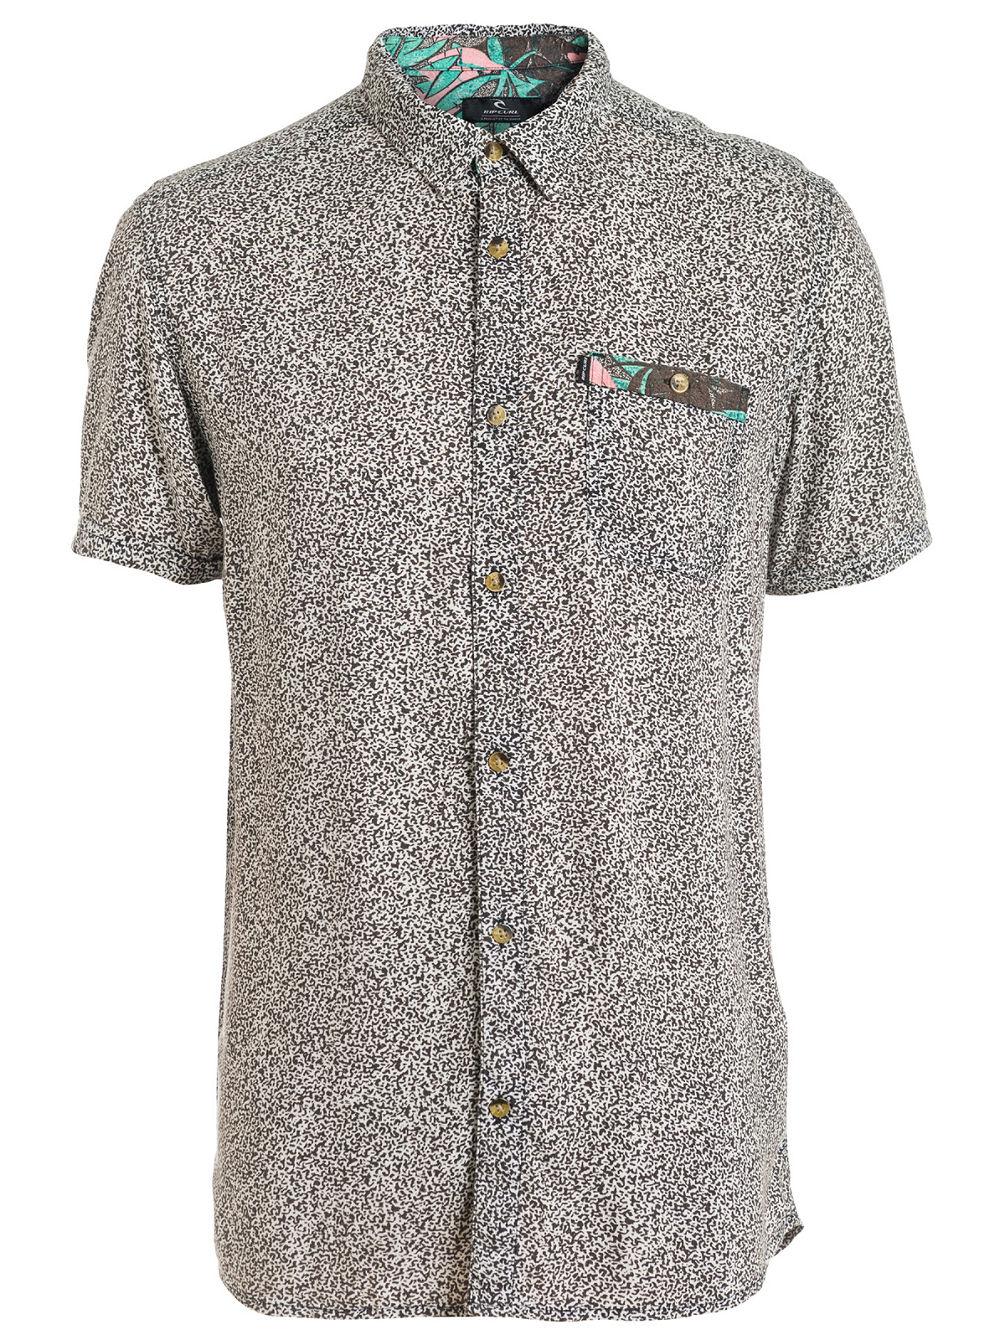 search-vibes-shirt